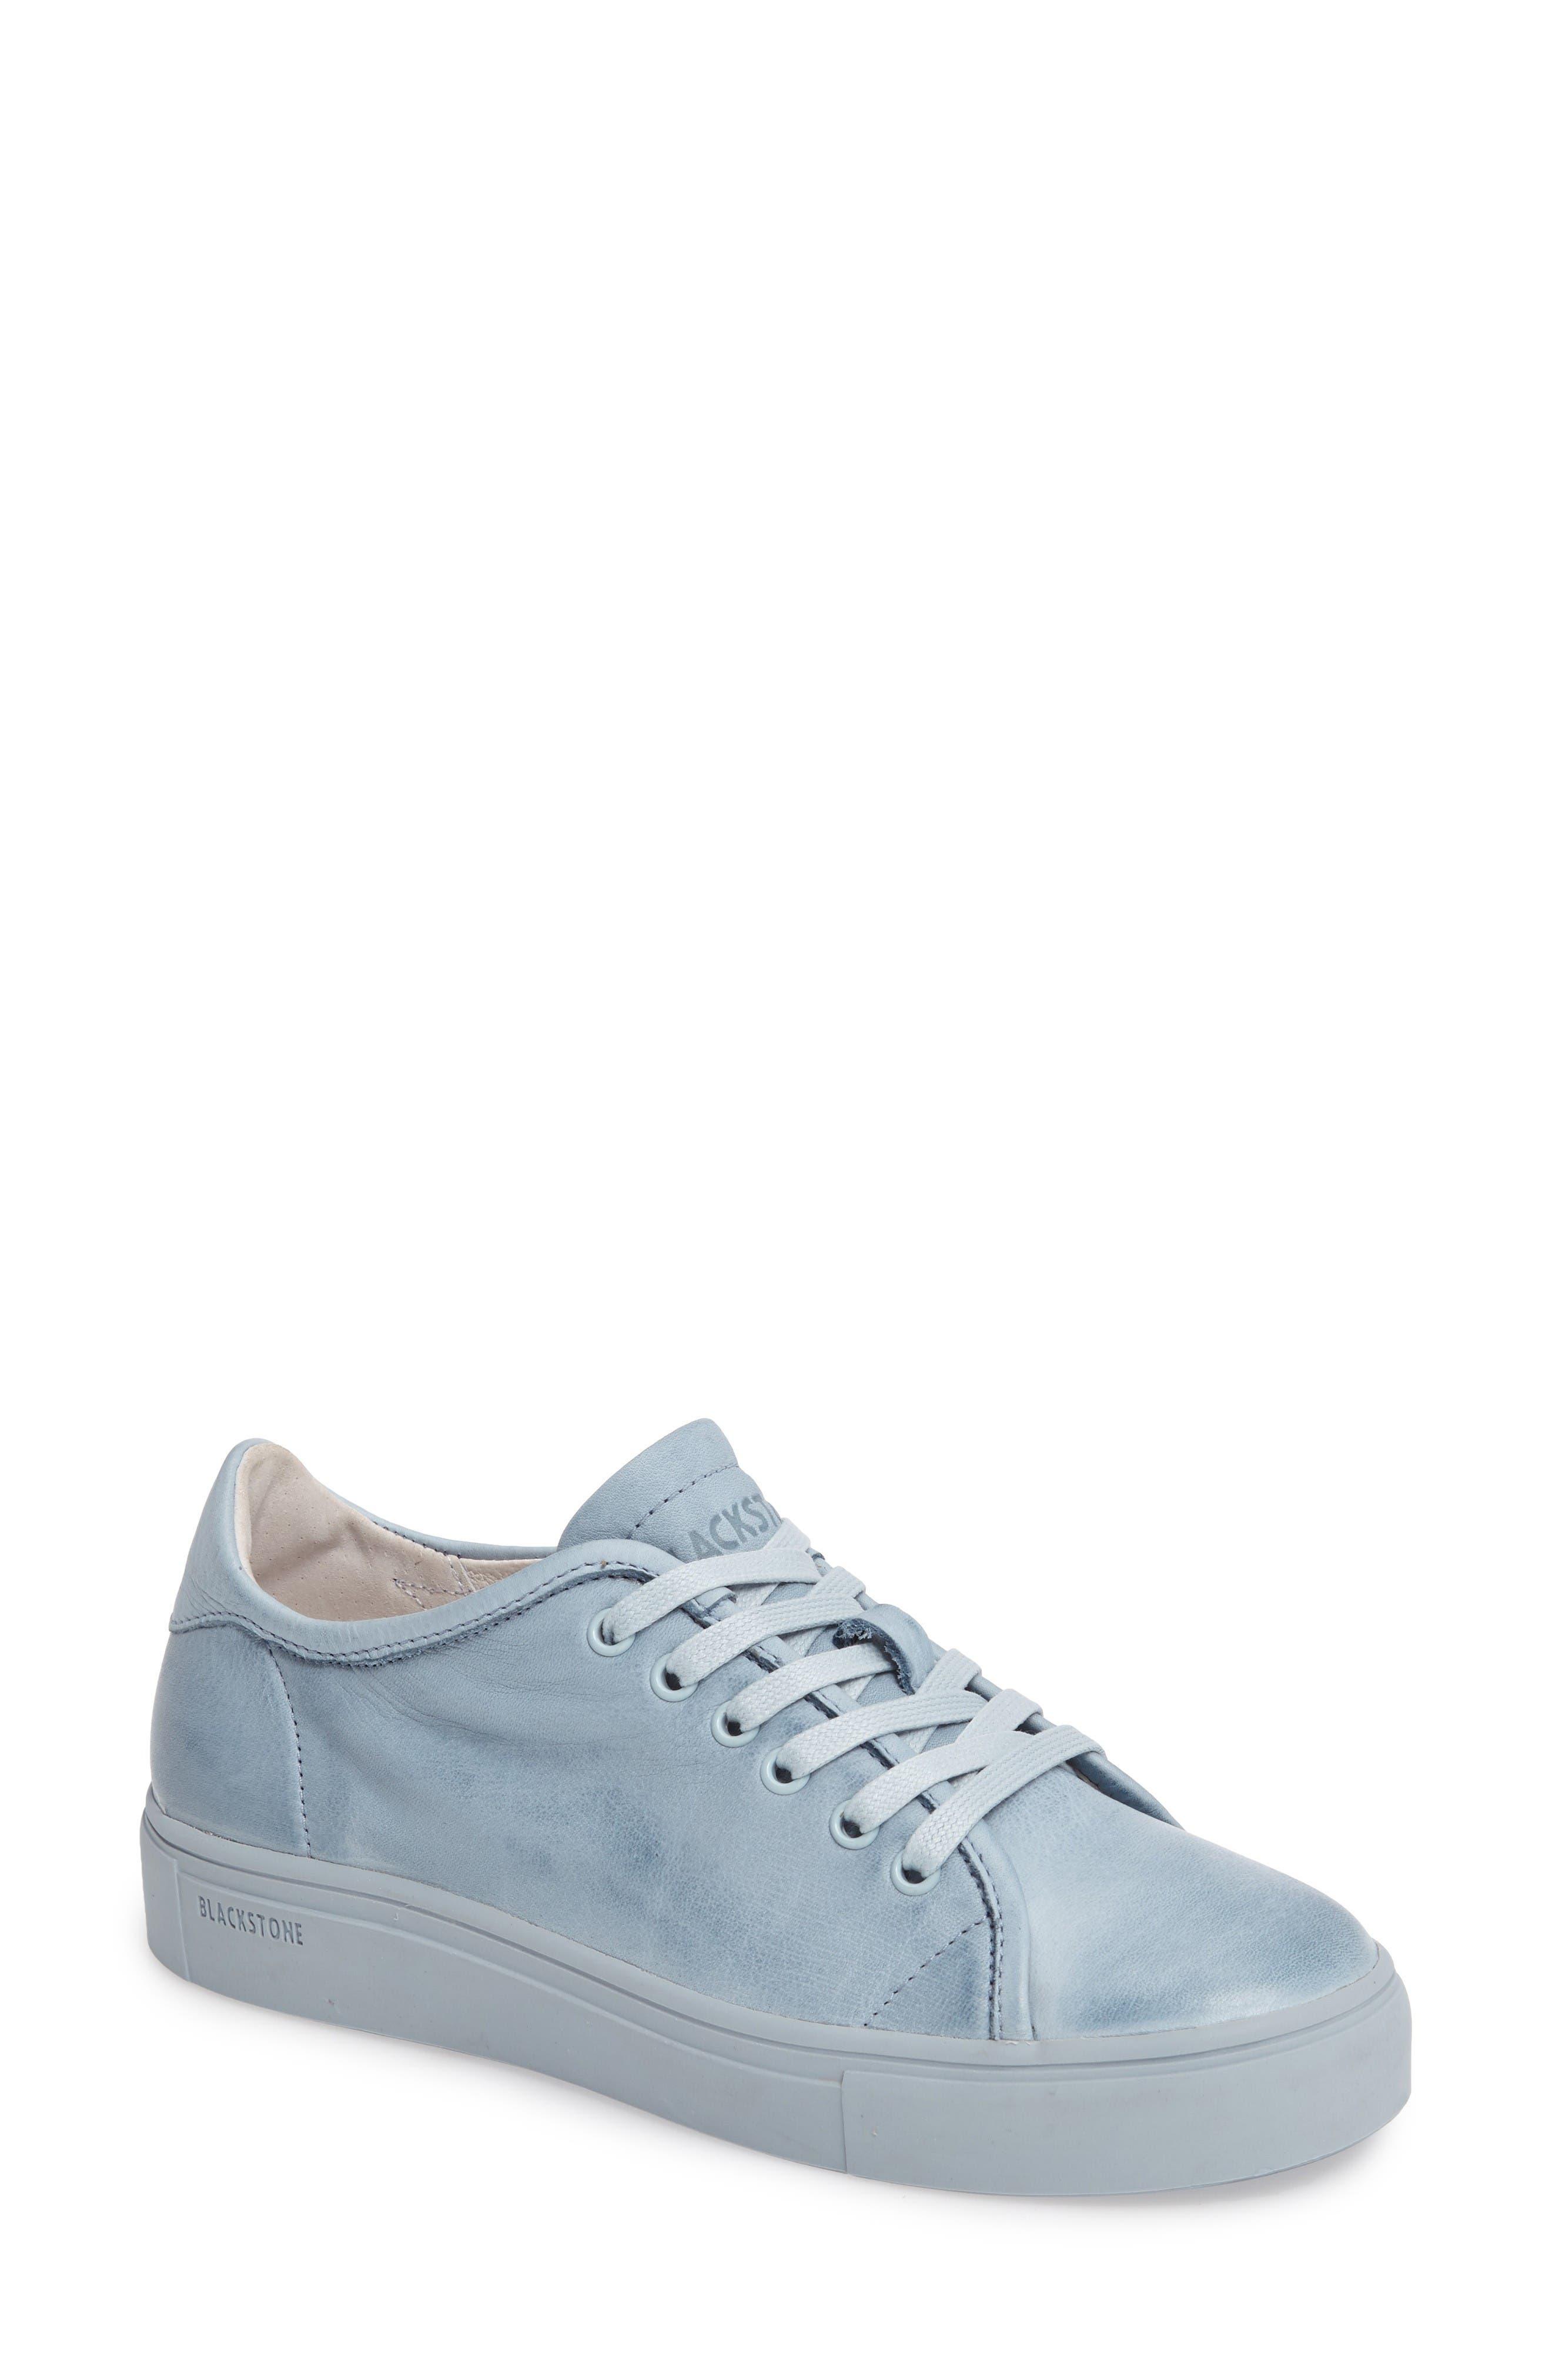 Alternate Image 1 Selected - Blackstone NL33 Sneaker (Women)